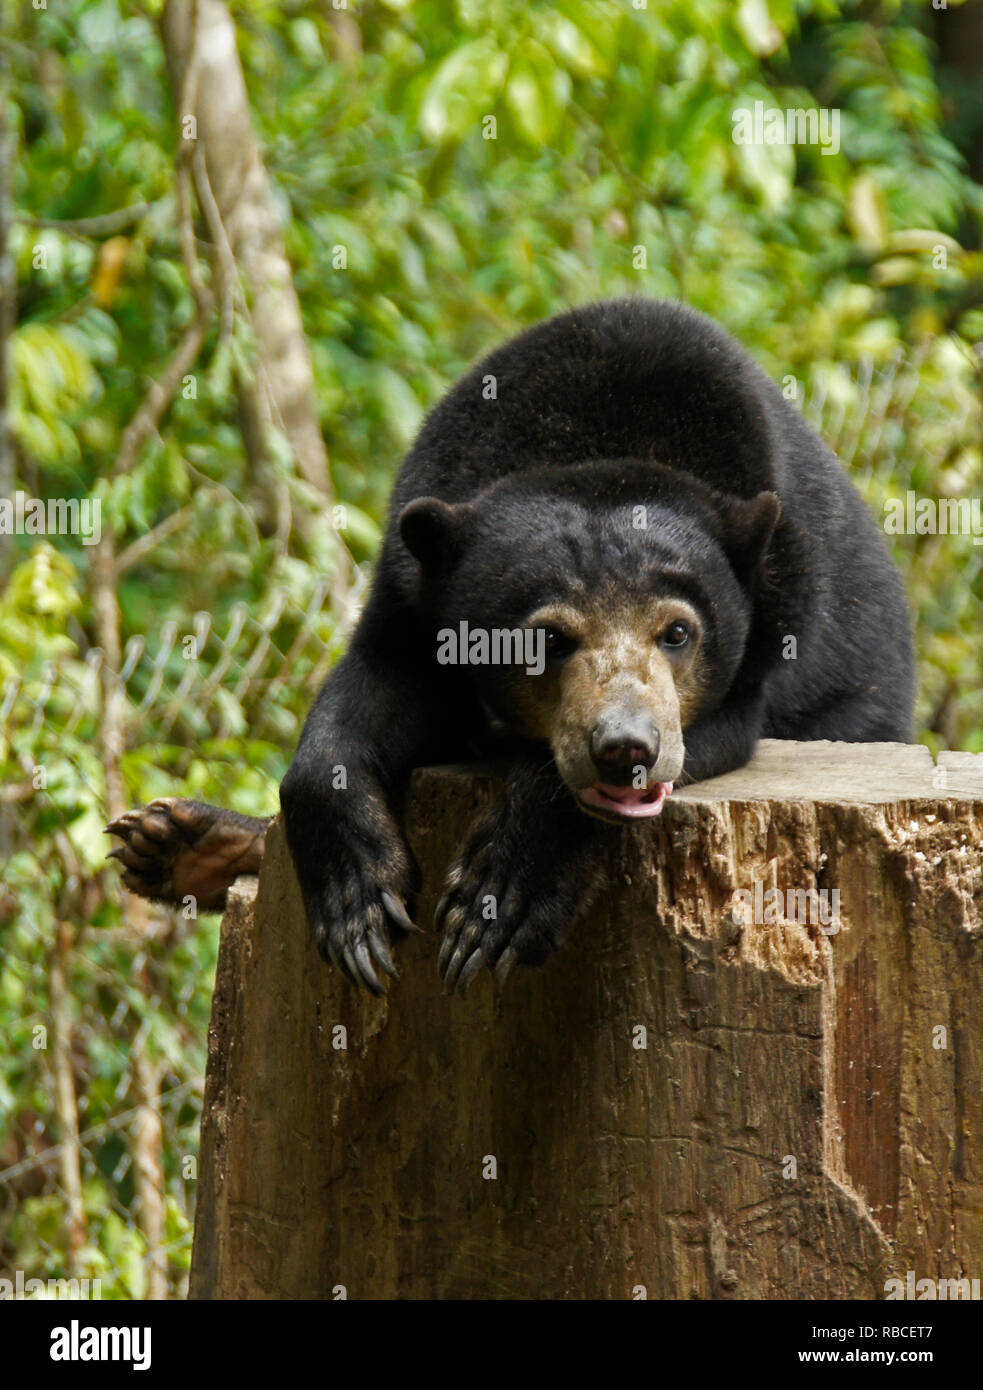 Malayan sun bear resting on tree stump at Bornean Sun Bear Conservation Centre, Sandakan, Sabah (Borneo), Malaysia - Stock Image